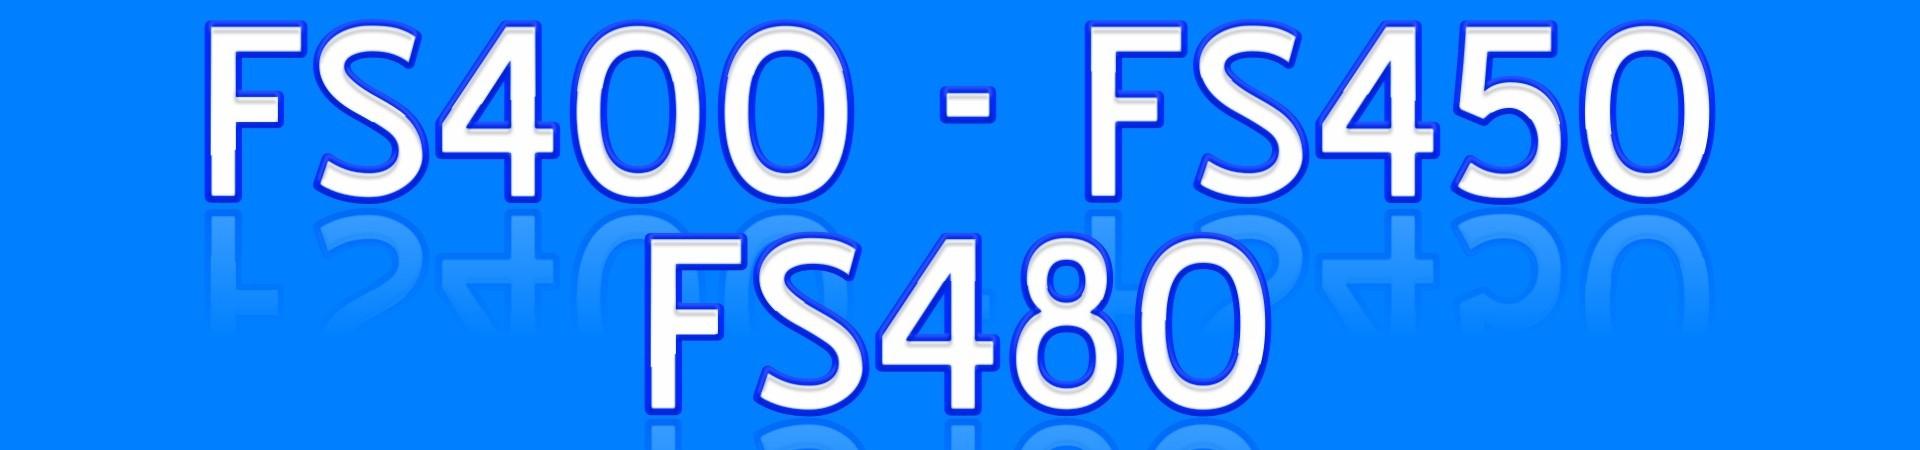 REPUESTOS para Desbrozadora STIHL FS400 FS450 FS480